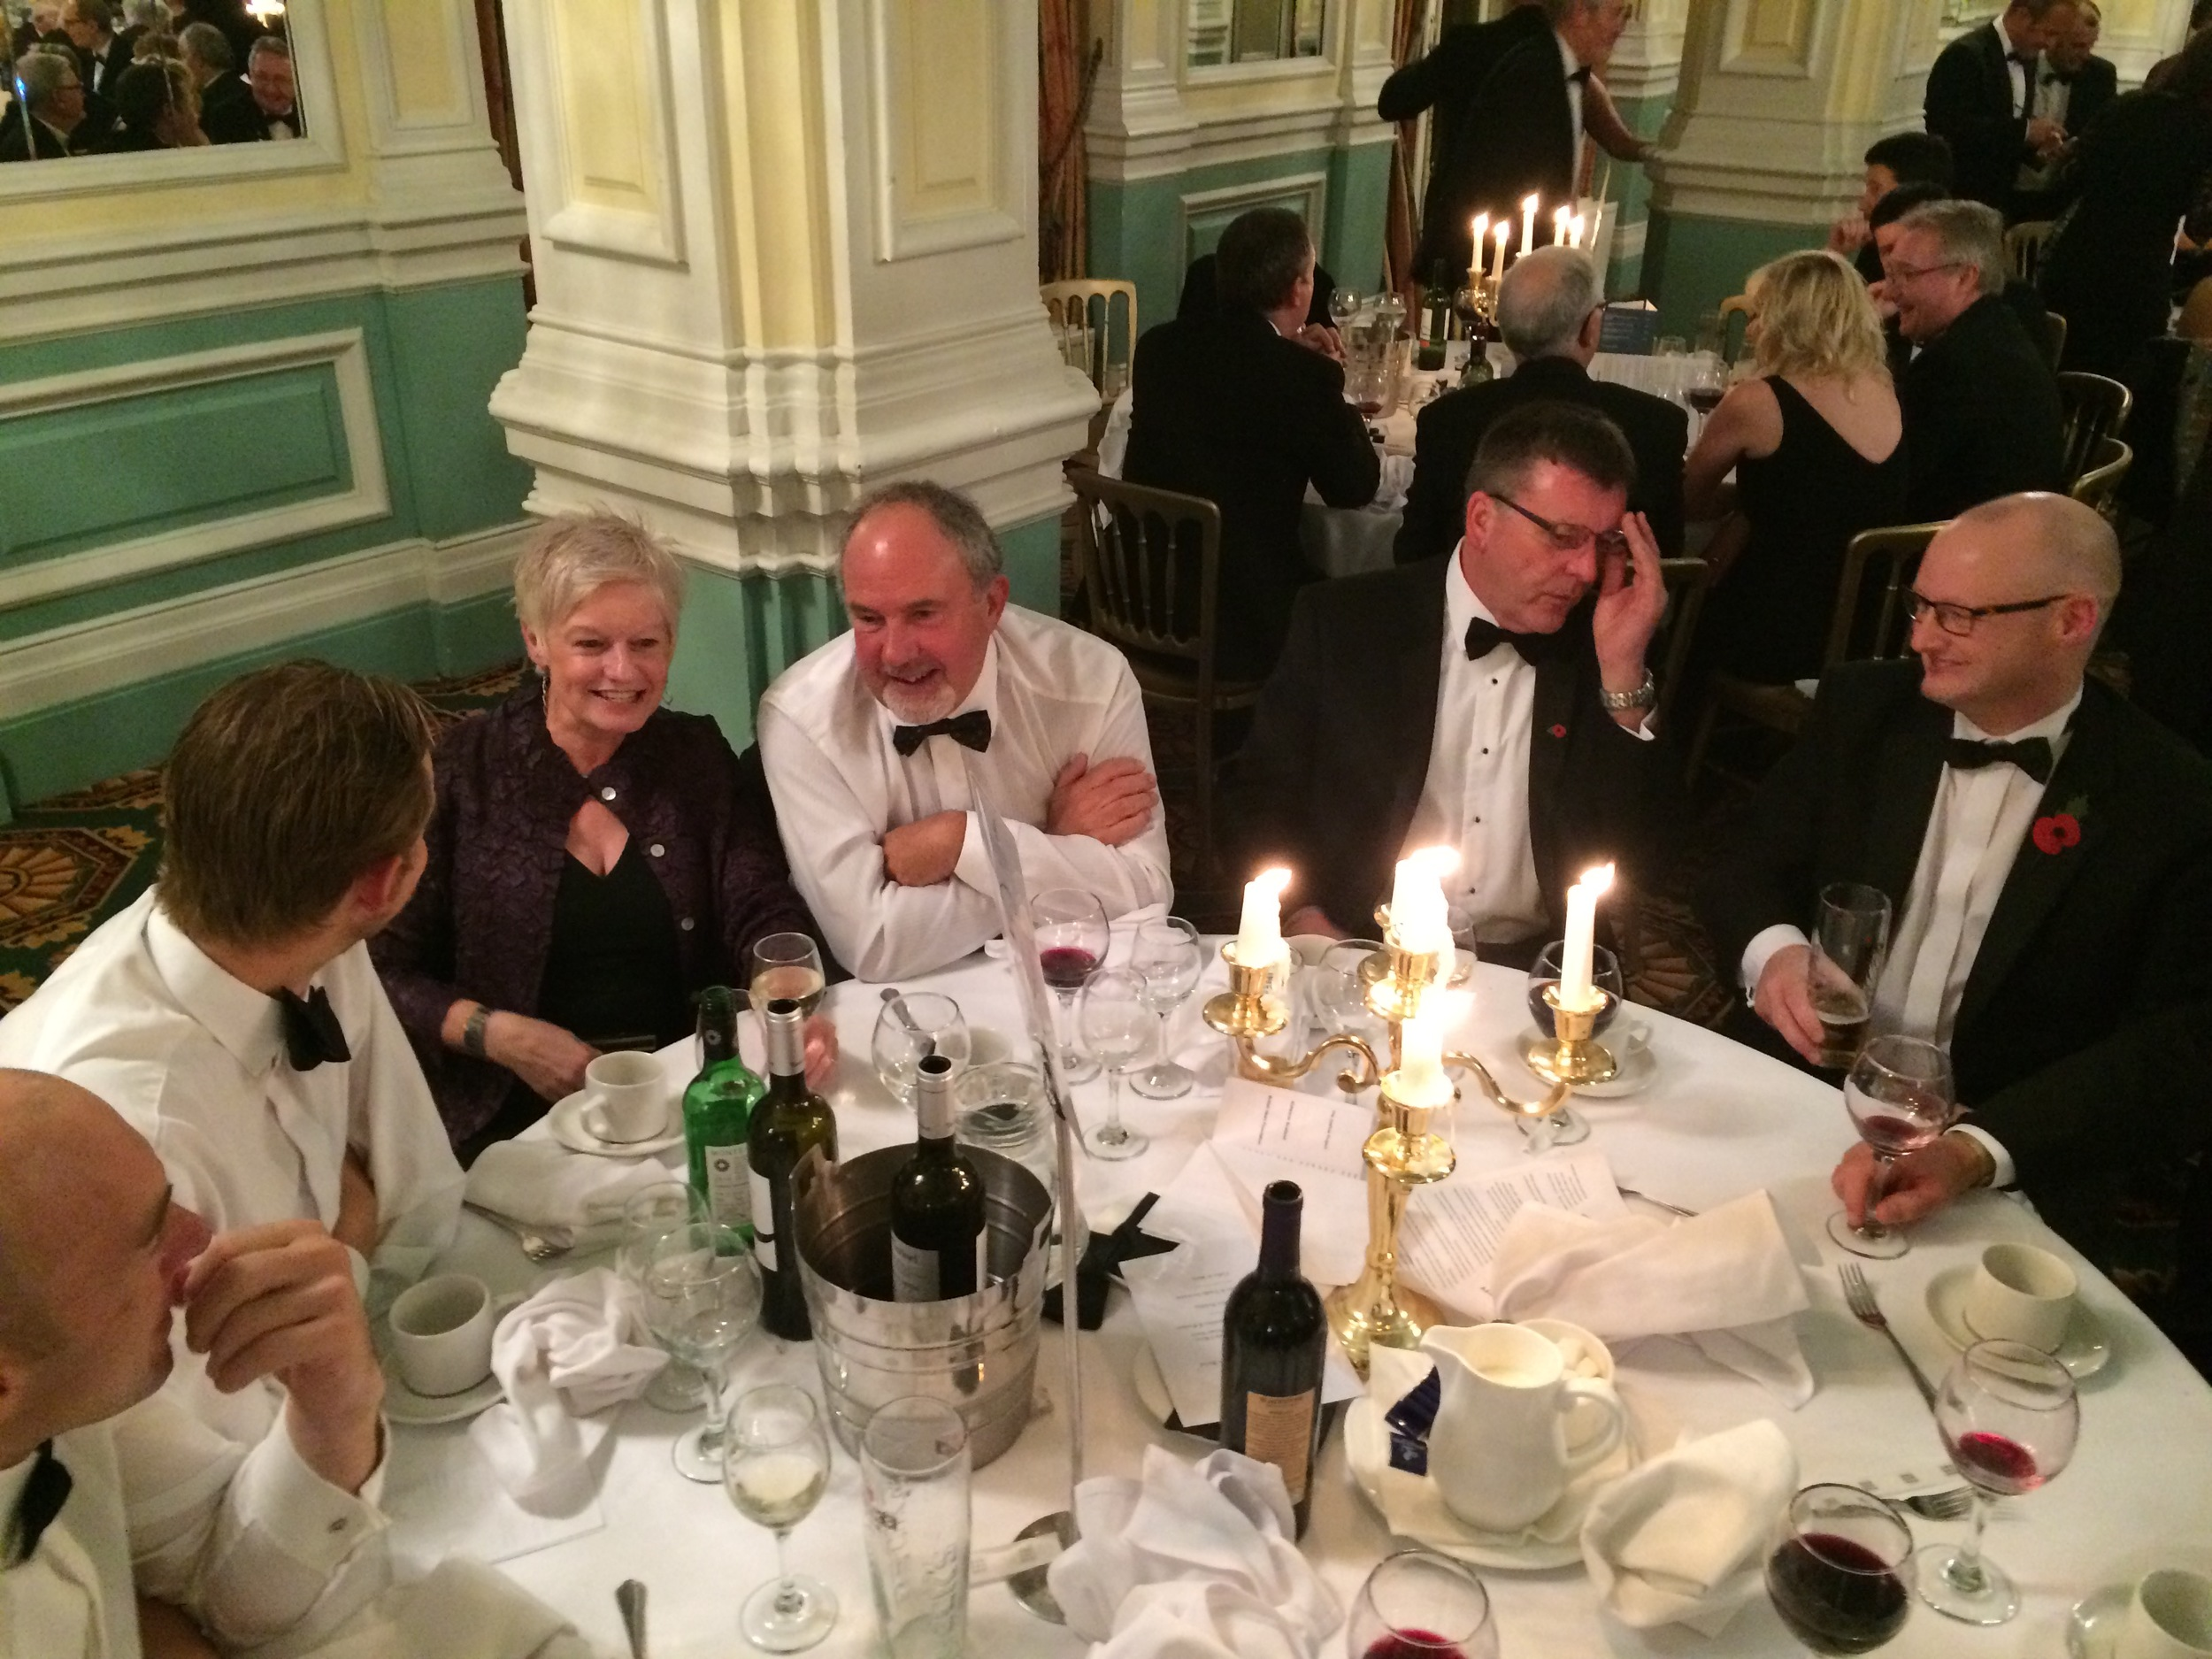 L - R: John Leather, Matthew Whitehead, Marcia Jennings, David Lister, David Lambert, Lee Hewitt.